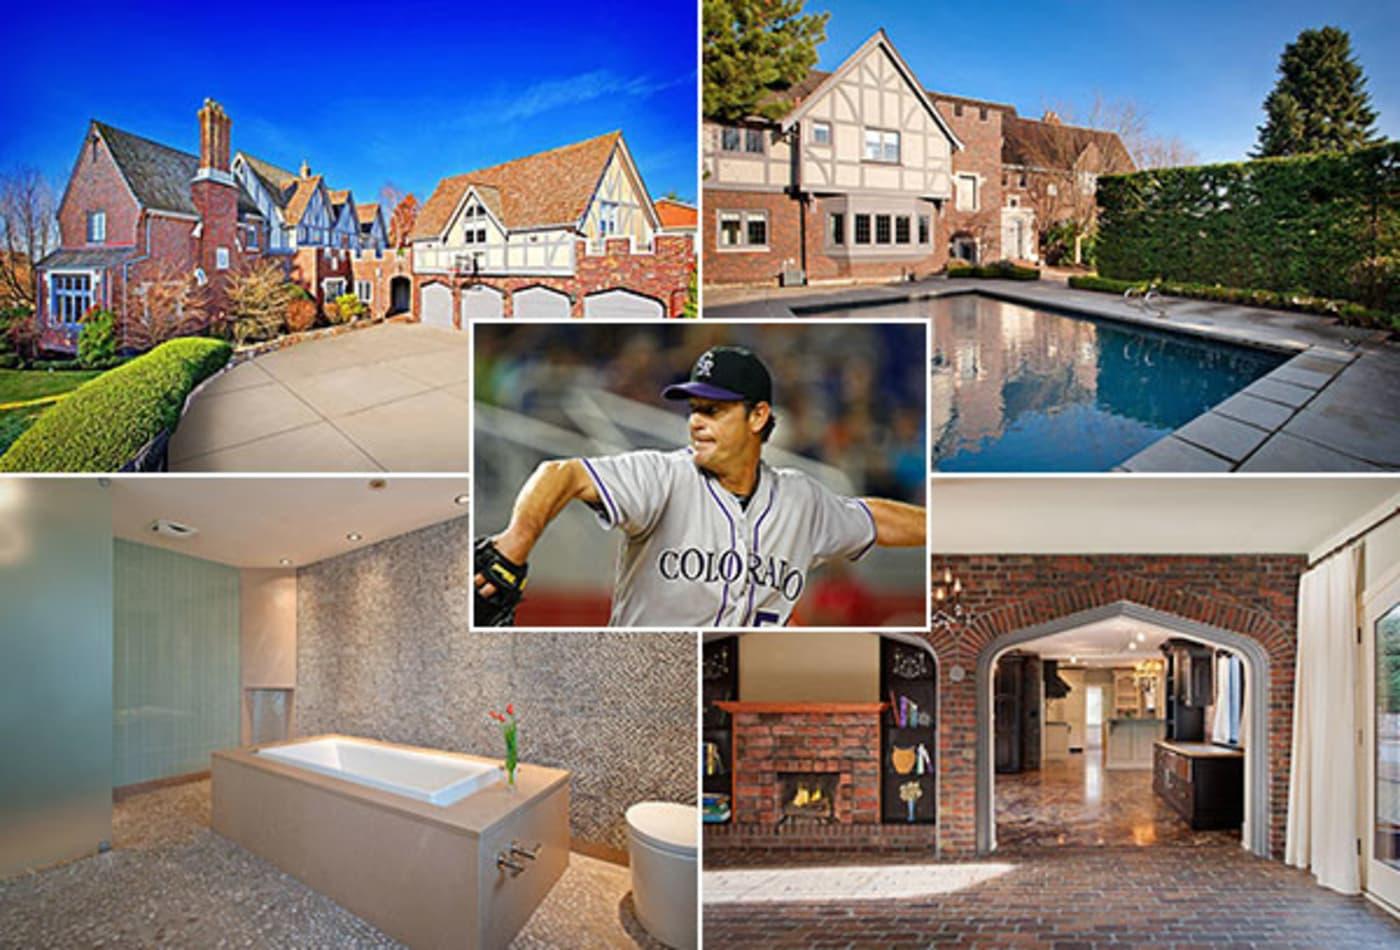 Jamie-Moyer-Coolest-Athlete-Homes.jpg